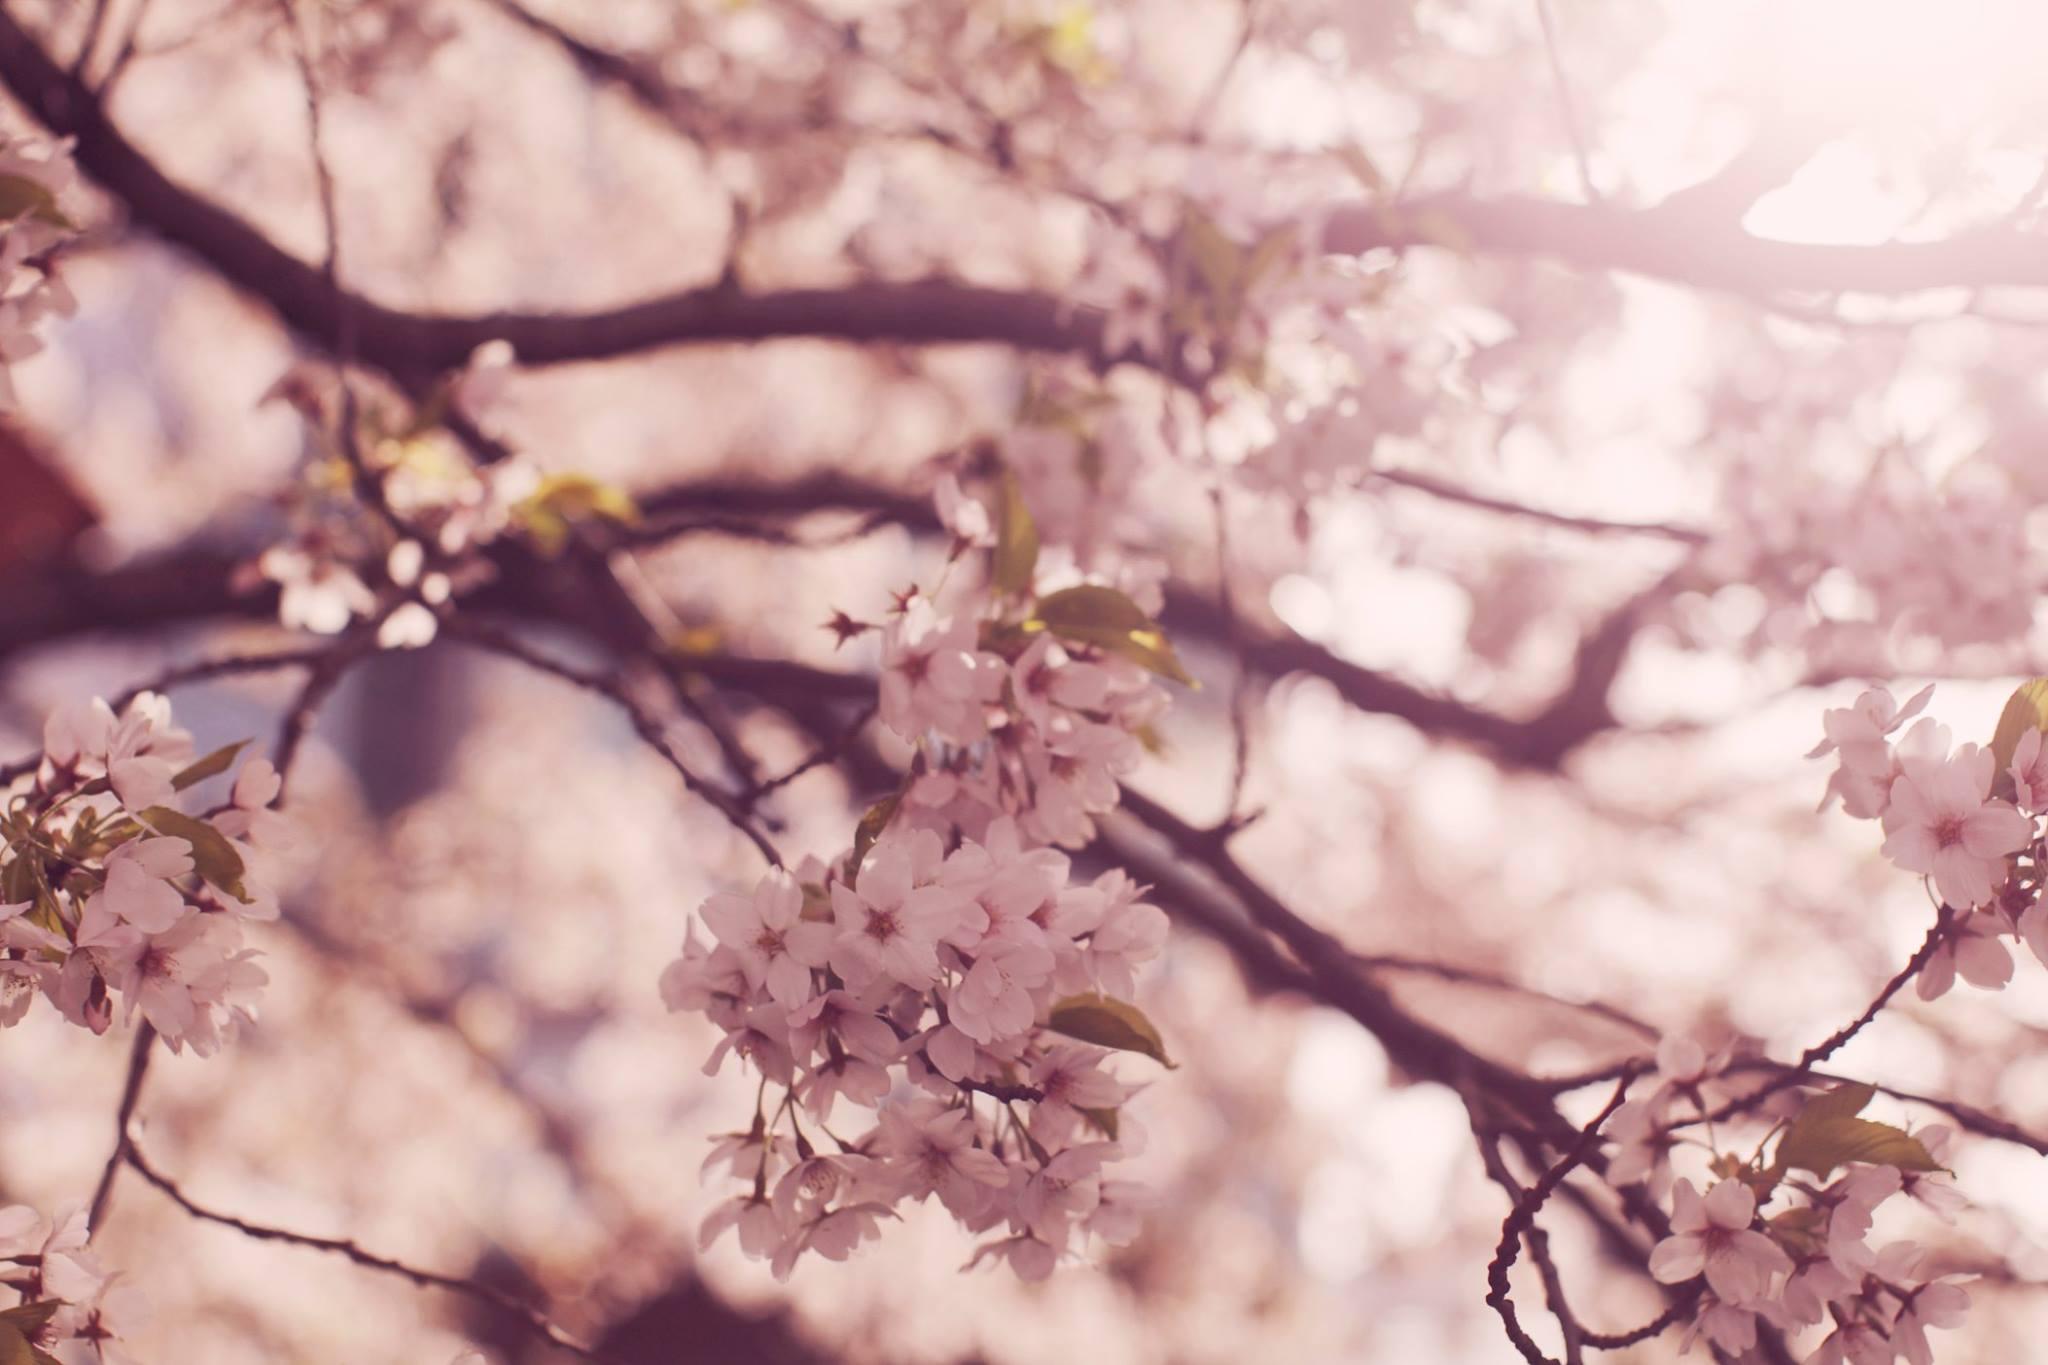 Beautiful pink cherry blossom sakura trees in spring in Sheffield, England.